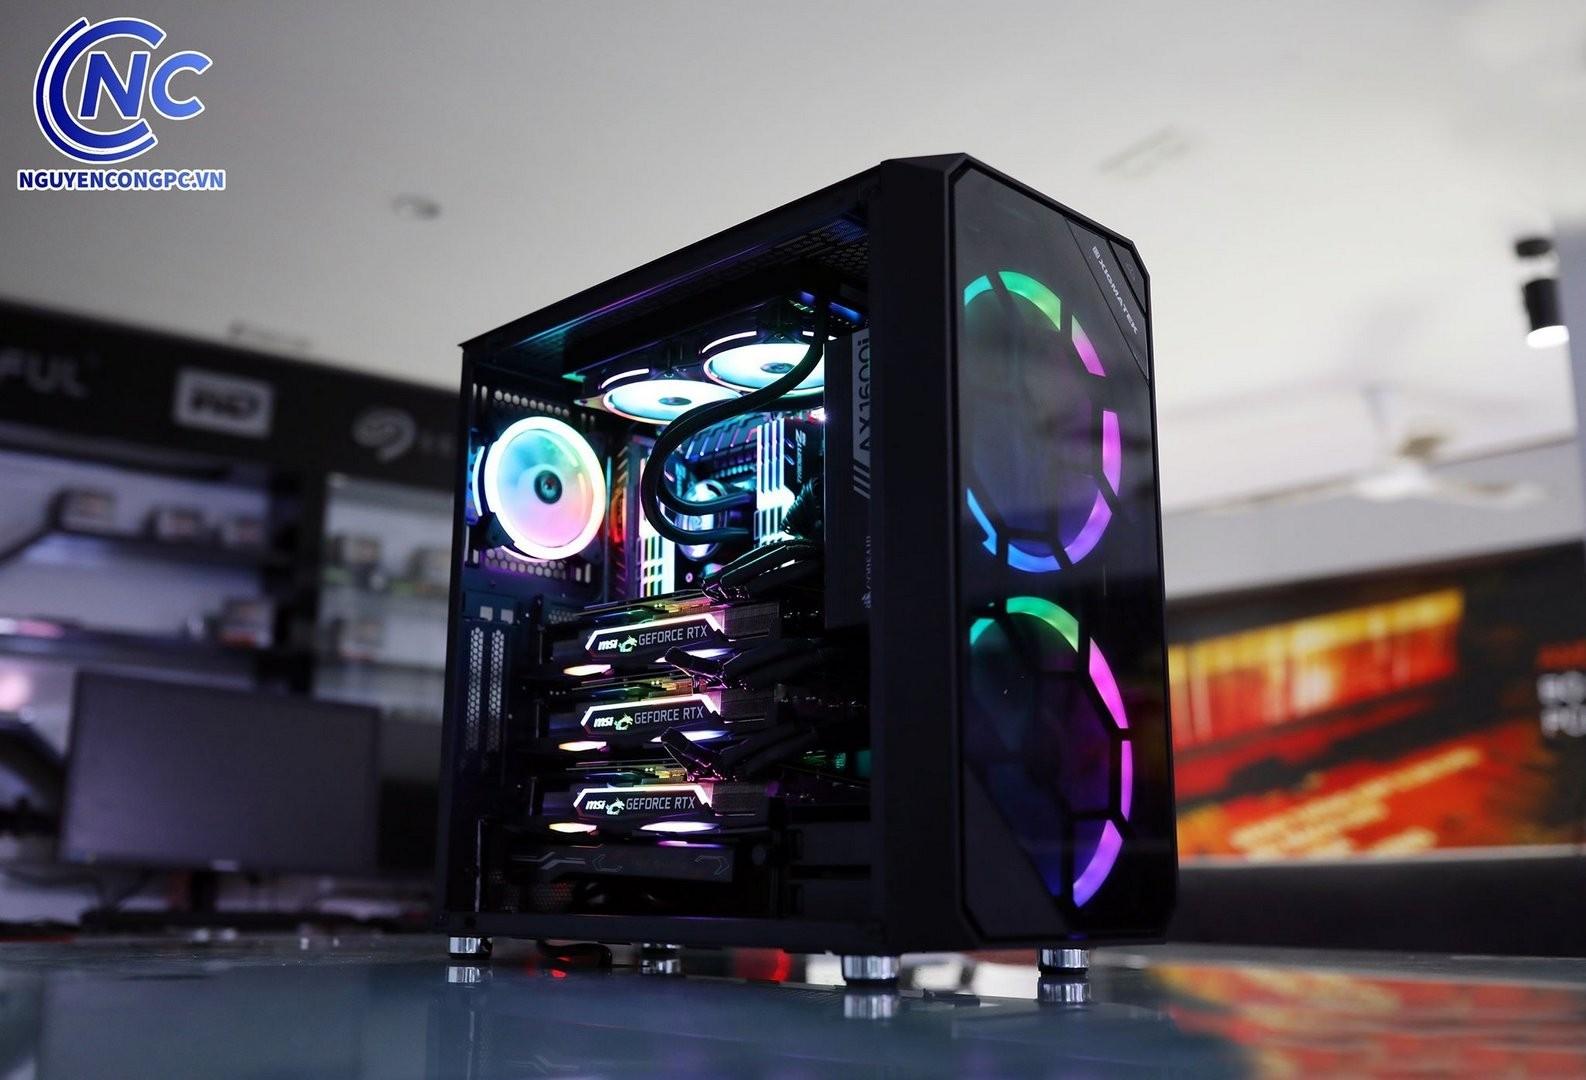 Bộ PC Ai (Deep Learning) i9 10900x case